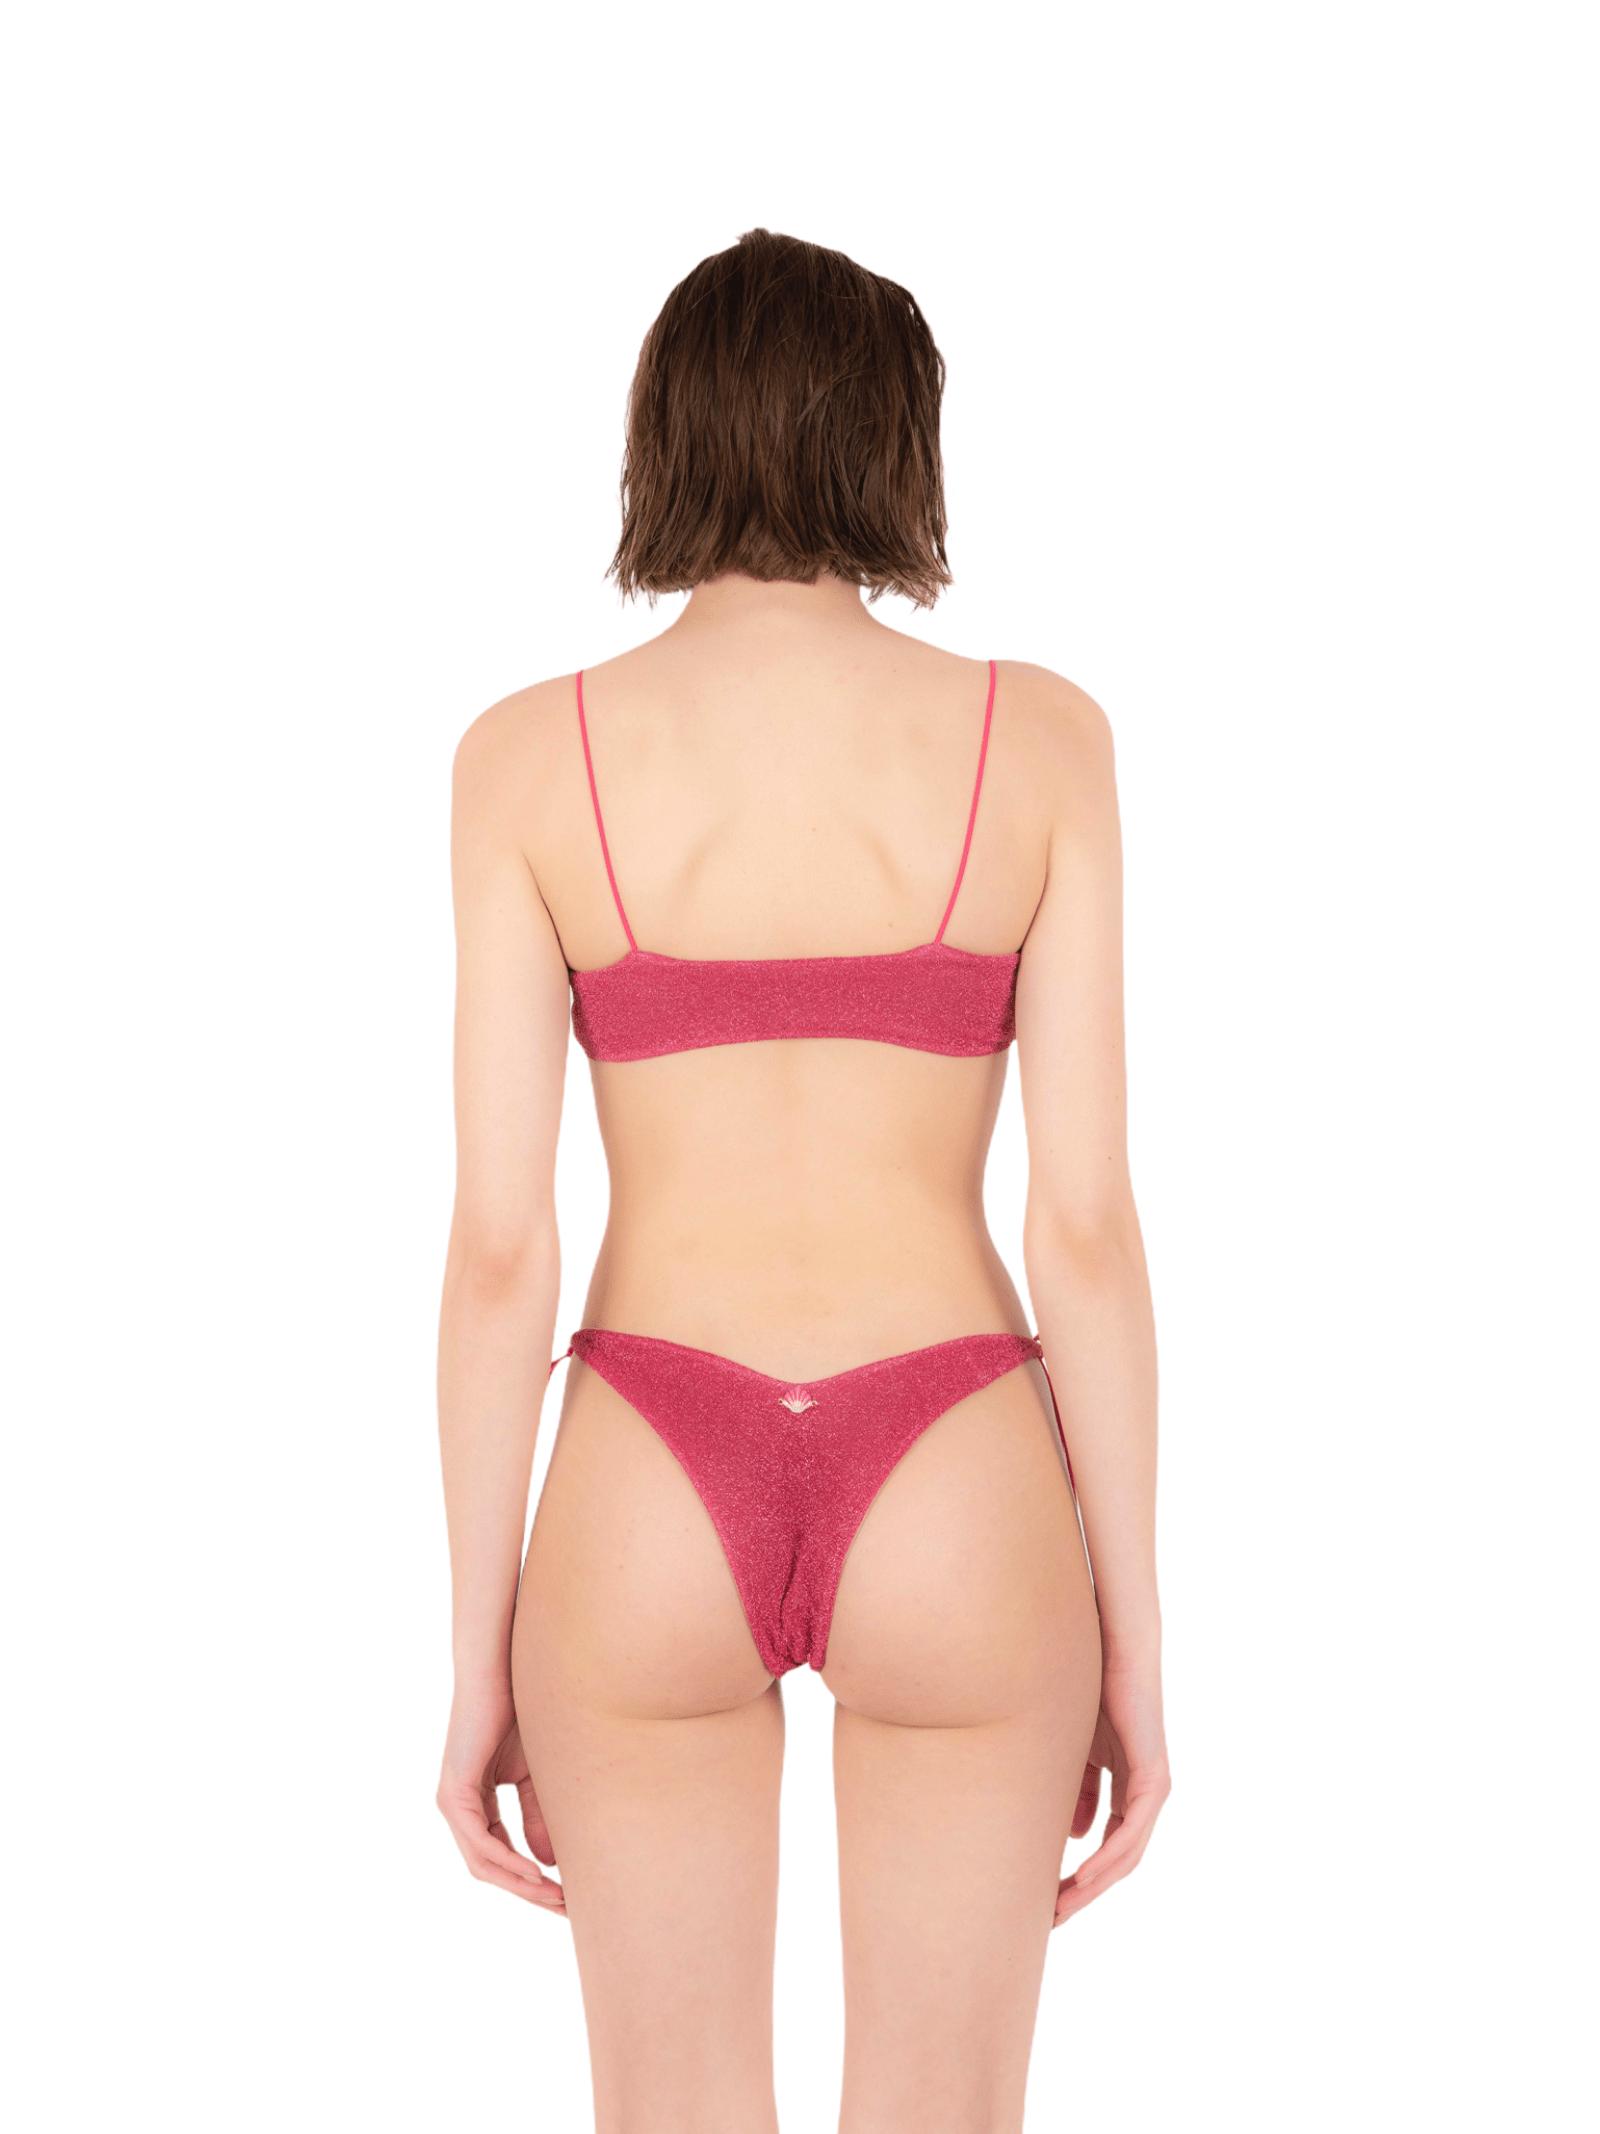 Bikini top with bow slip ANNAMARE | 23 | BK-115ROSA